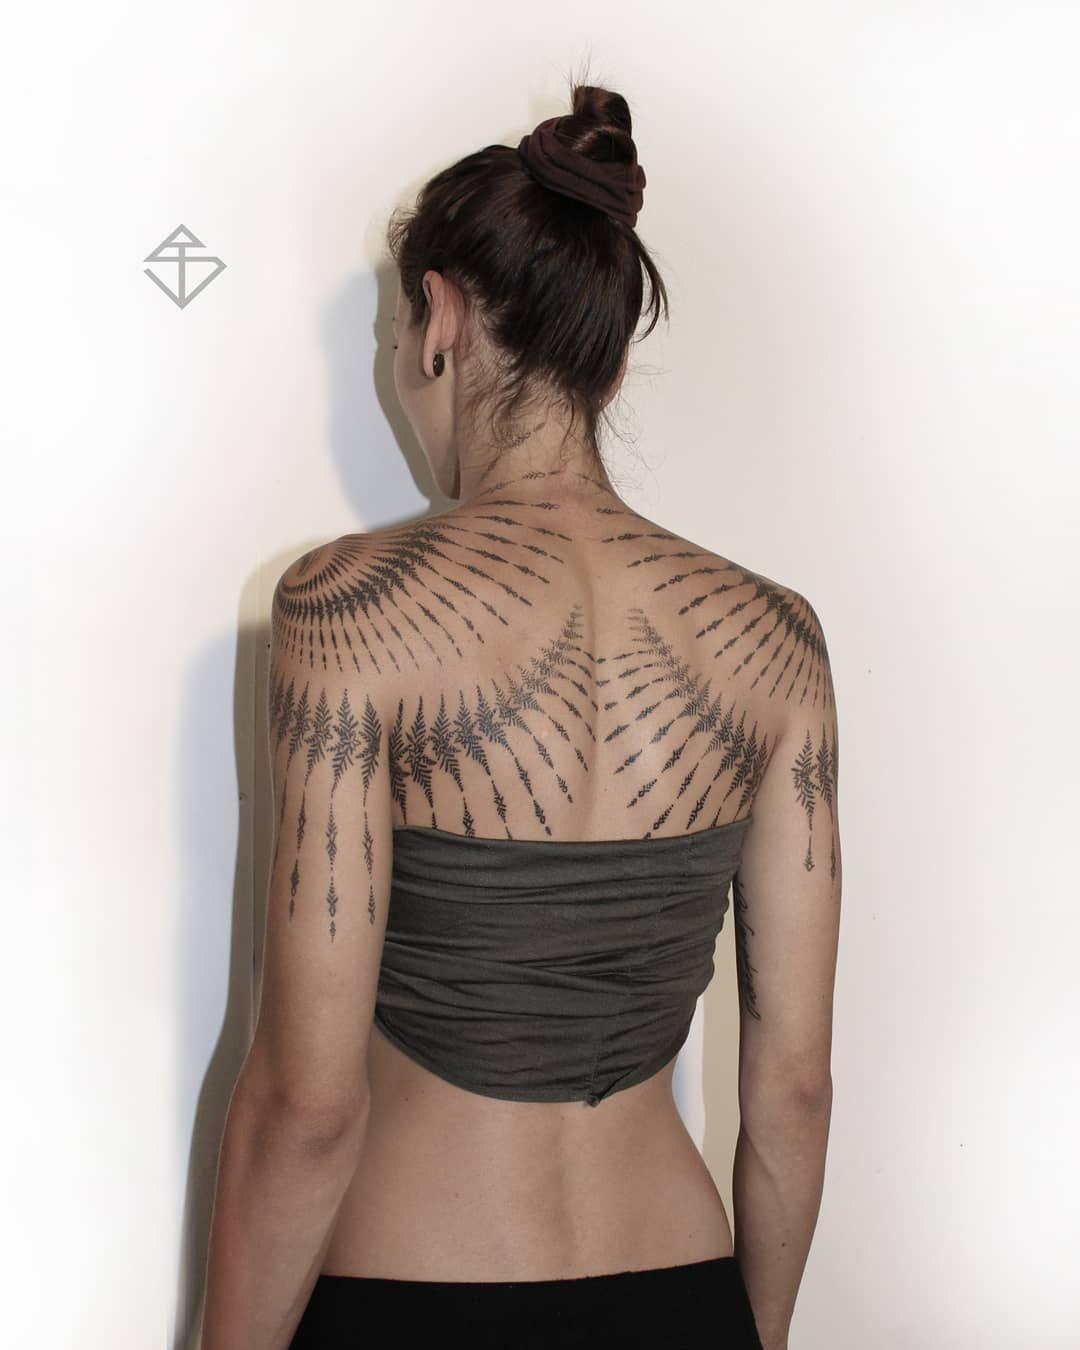 Cool Tribal Tattoos Designs (18)